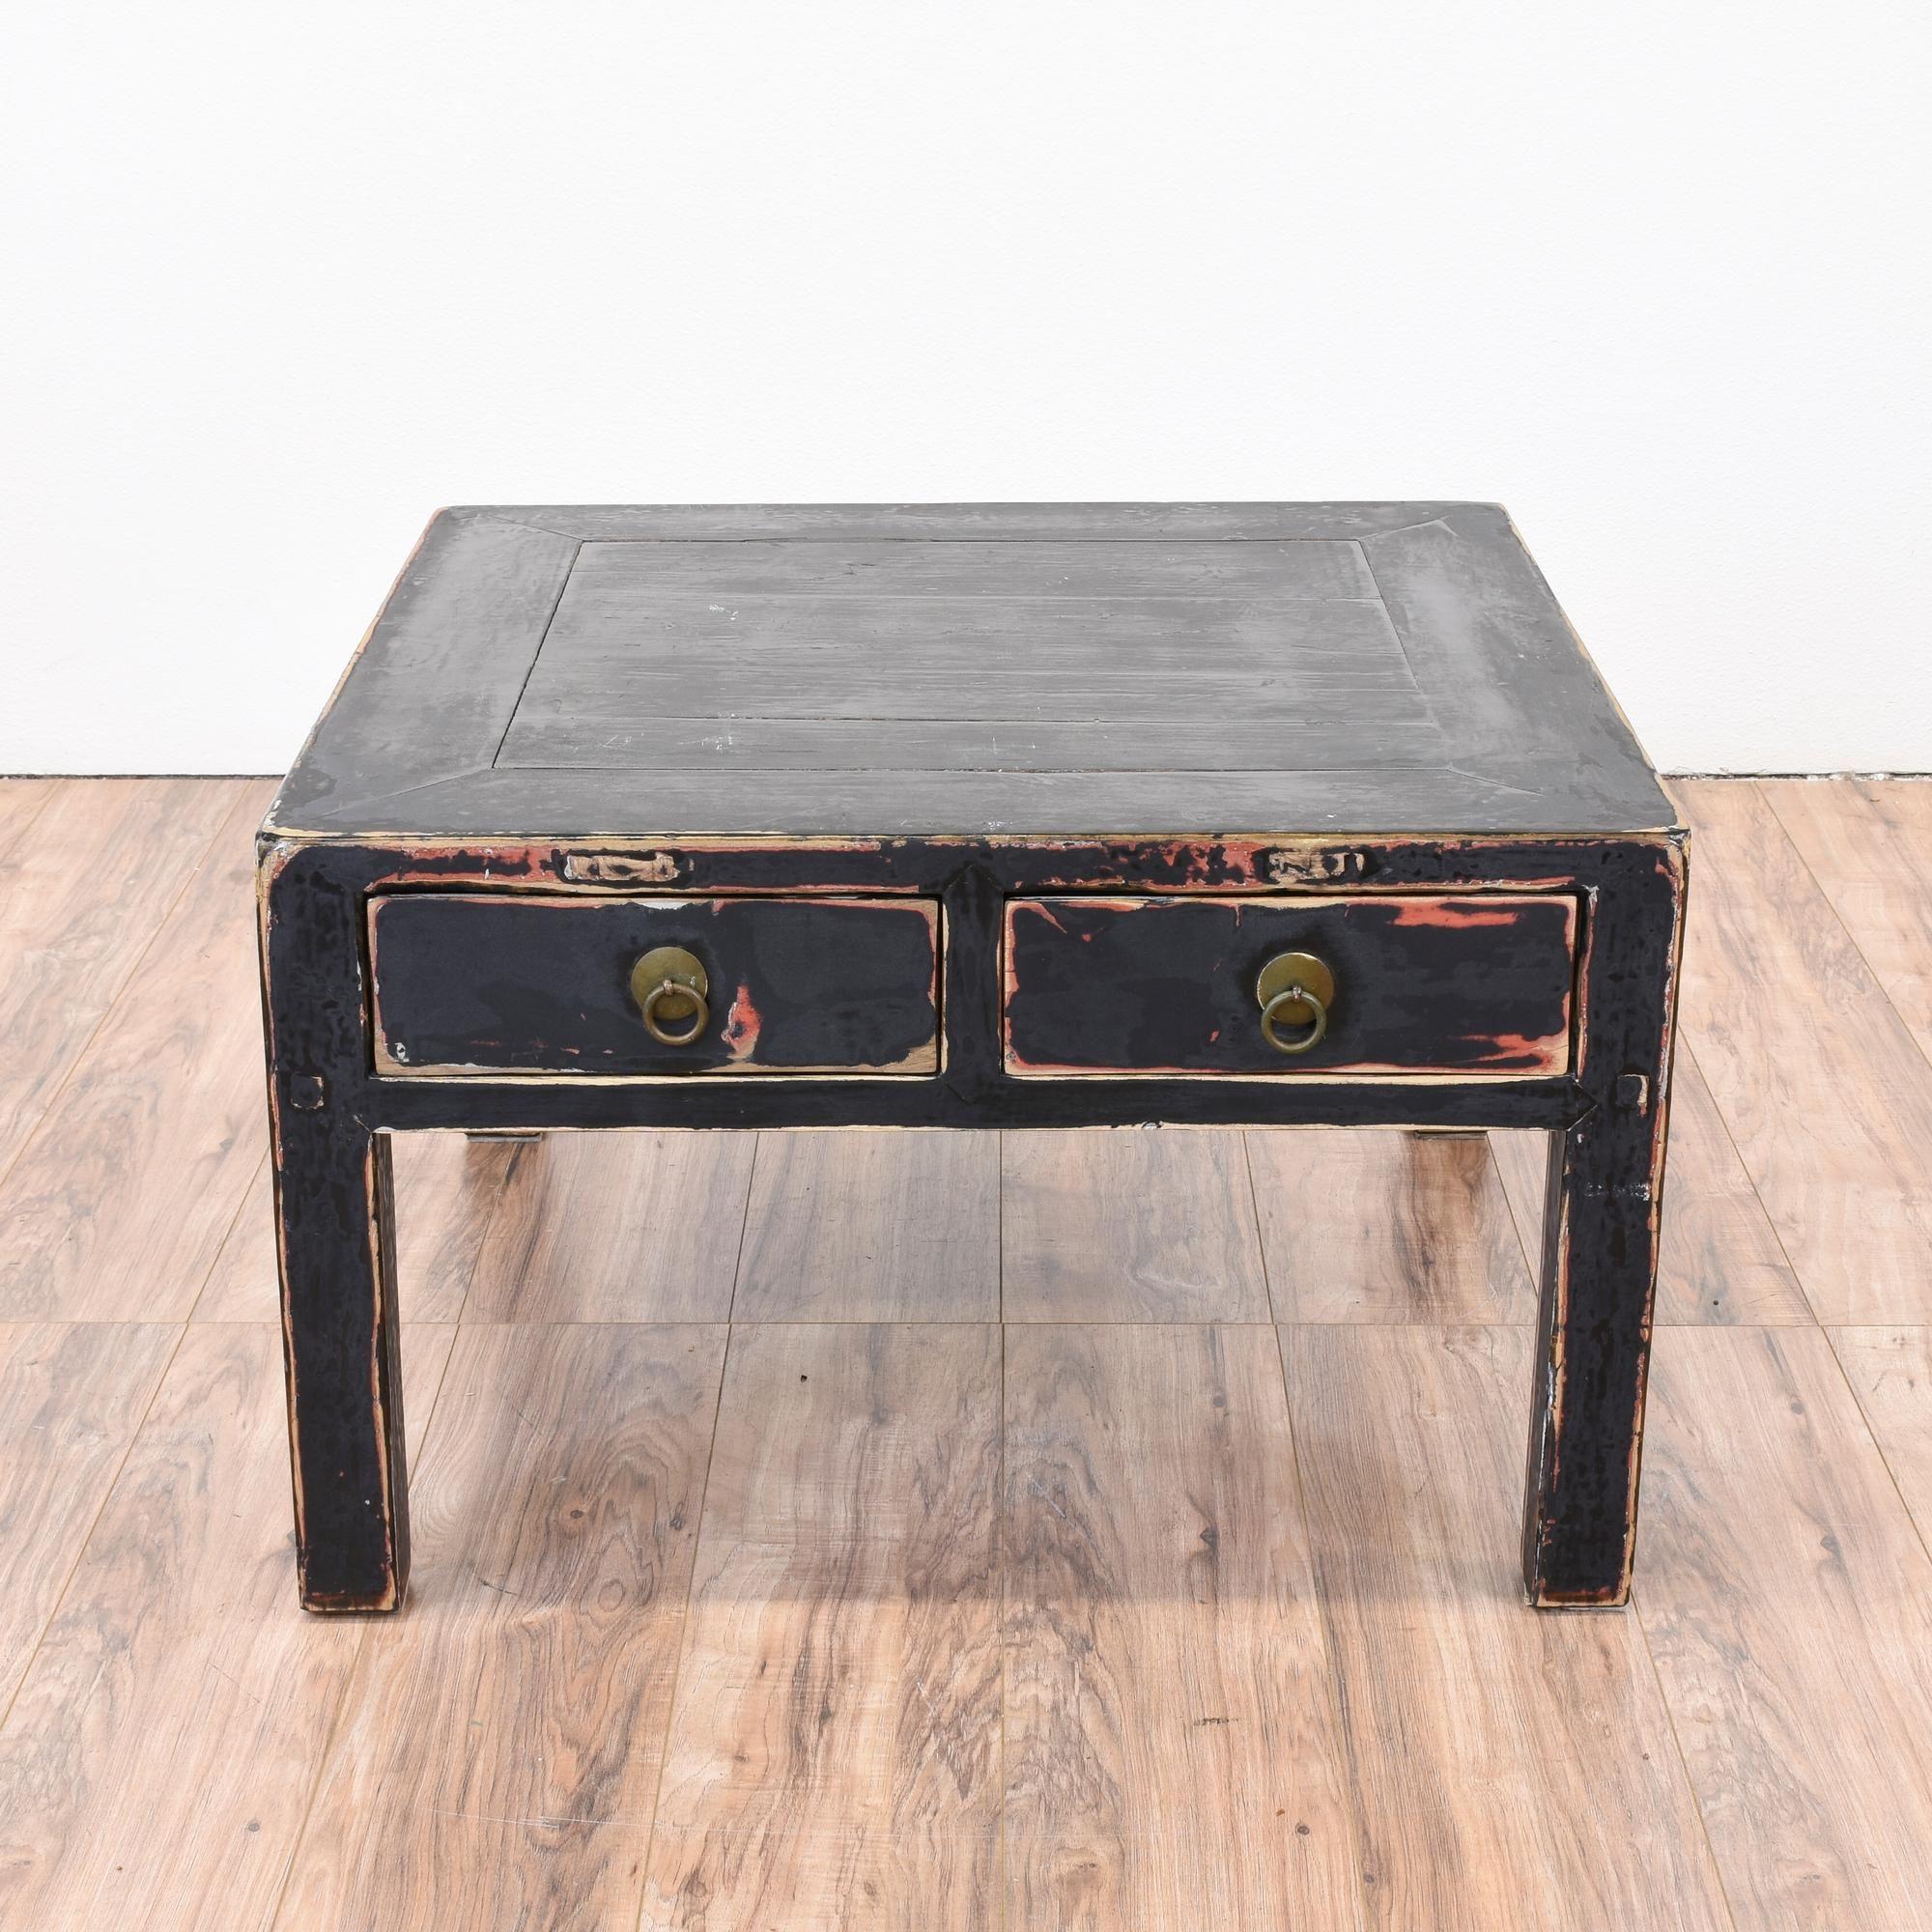 Square Black Shabby Chic Coffee Table